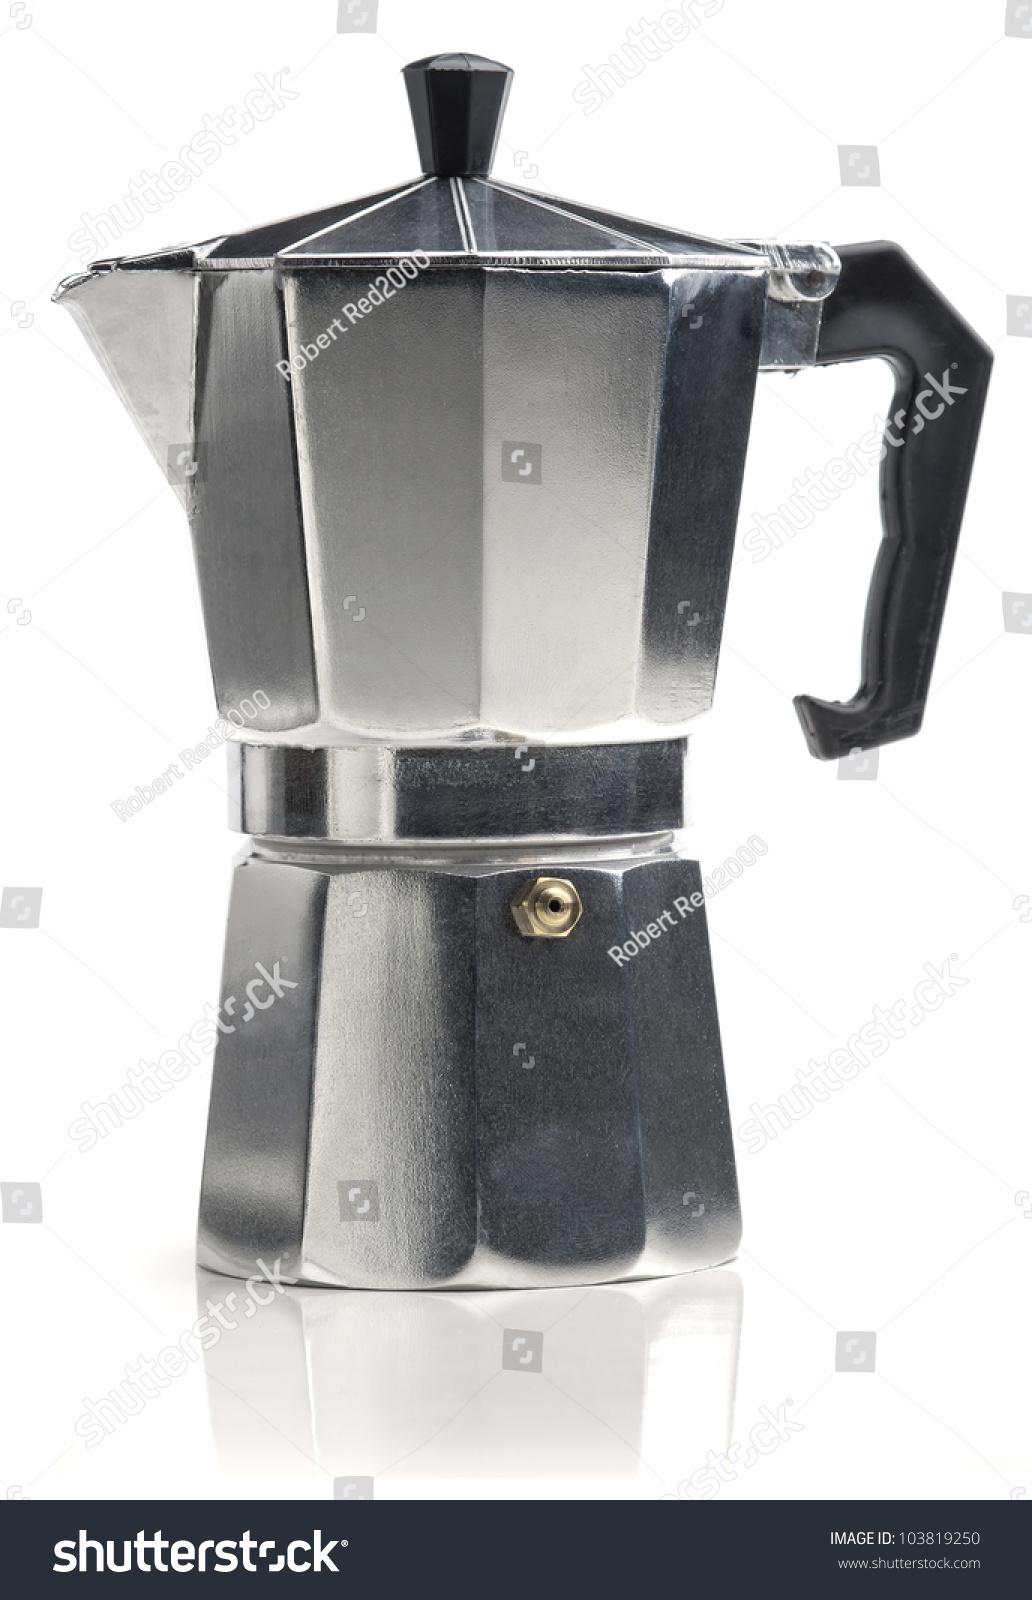 Italian Coffee Maker Vector : Italian Coffee Maker Isolated On White Stock Photo 103819250 - Shutterstock